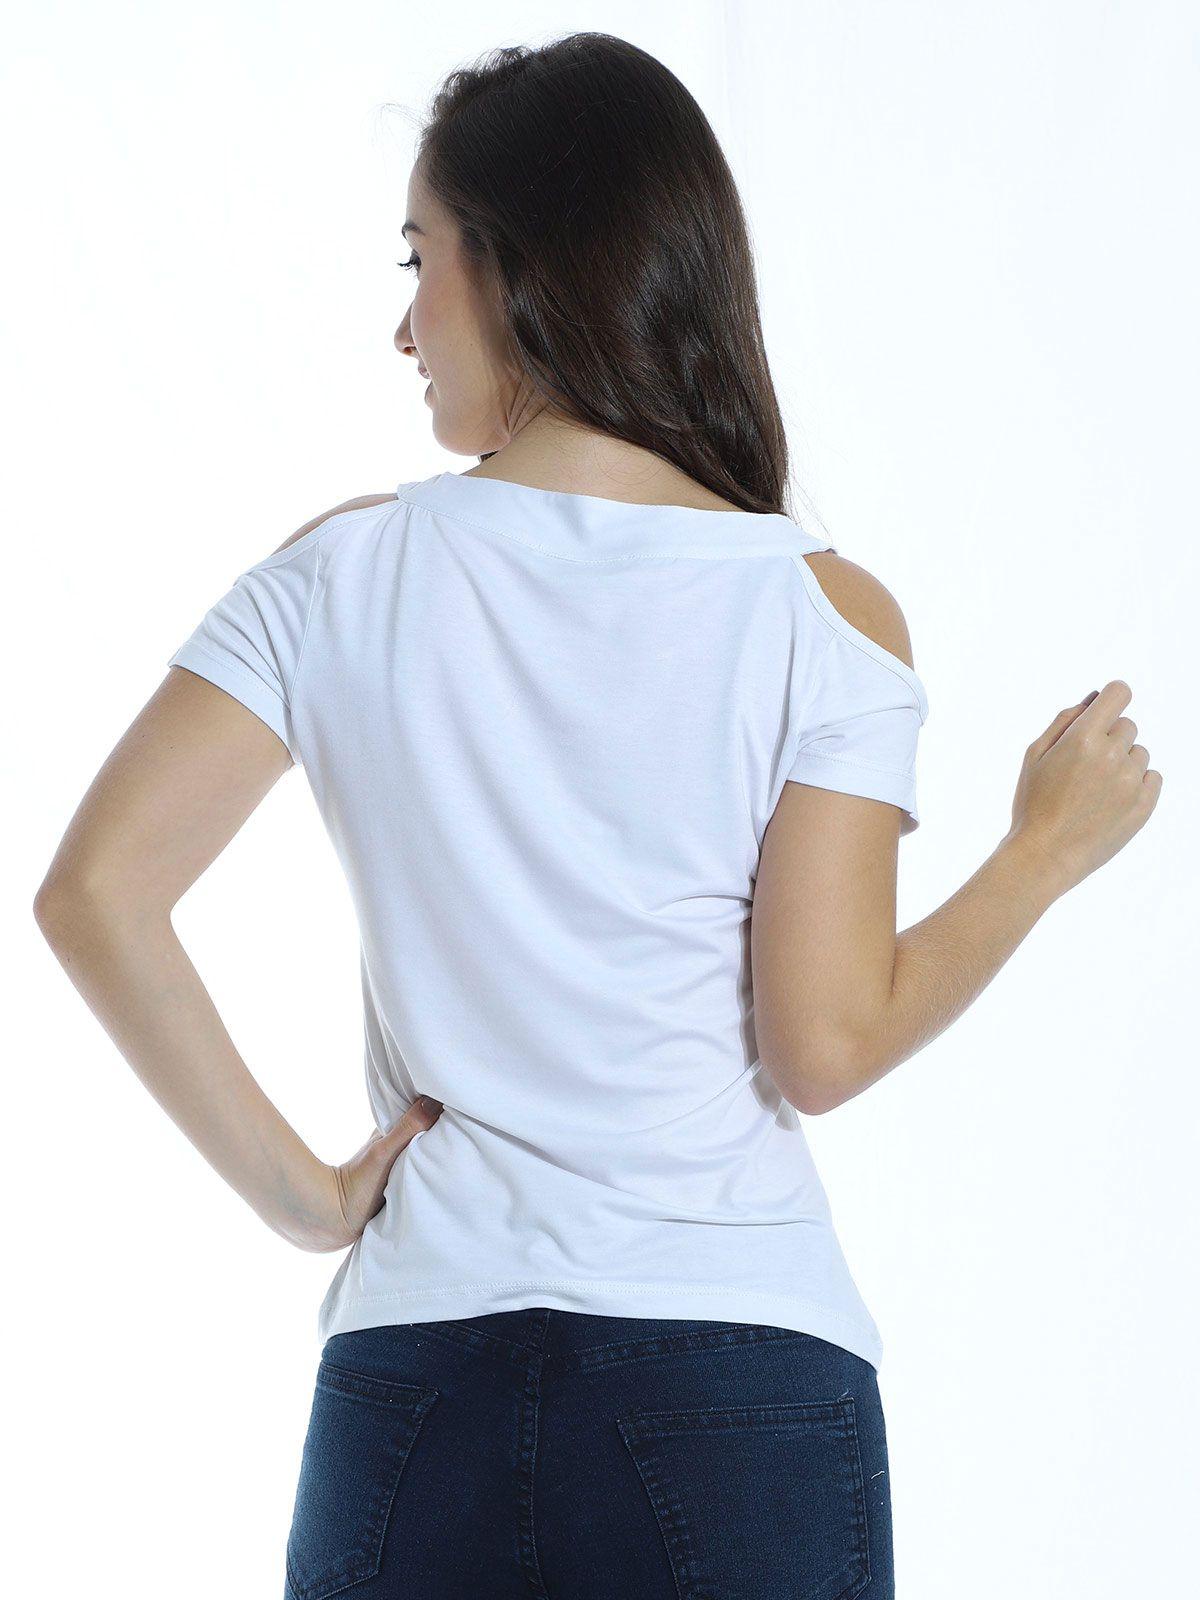 Blusa Anistia Viscolycra Decote Diferenciado Branco